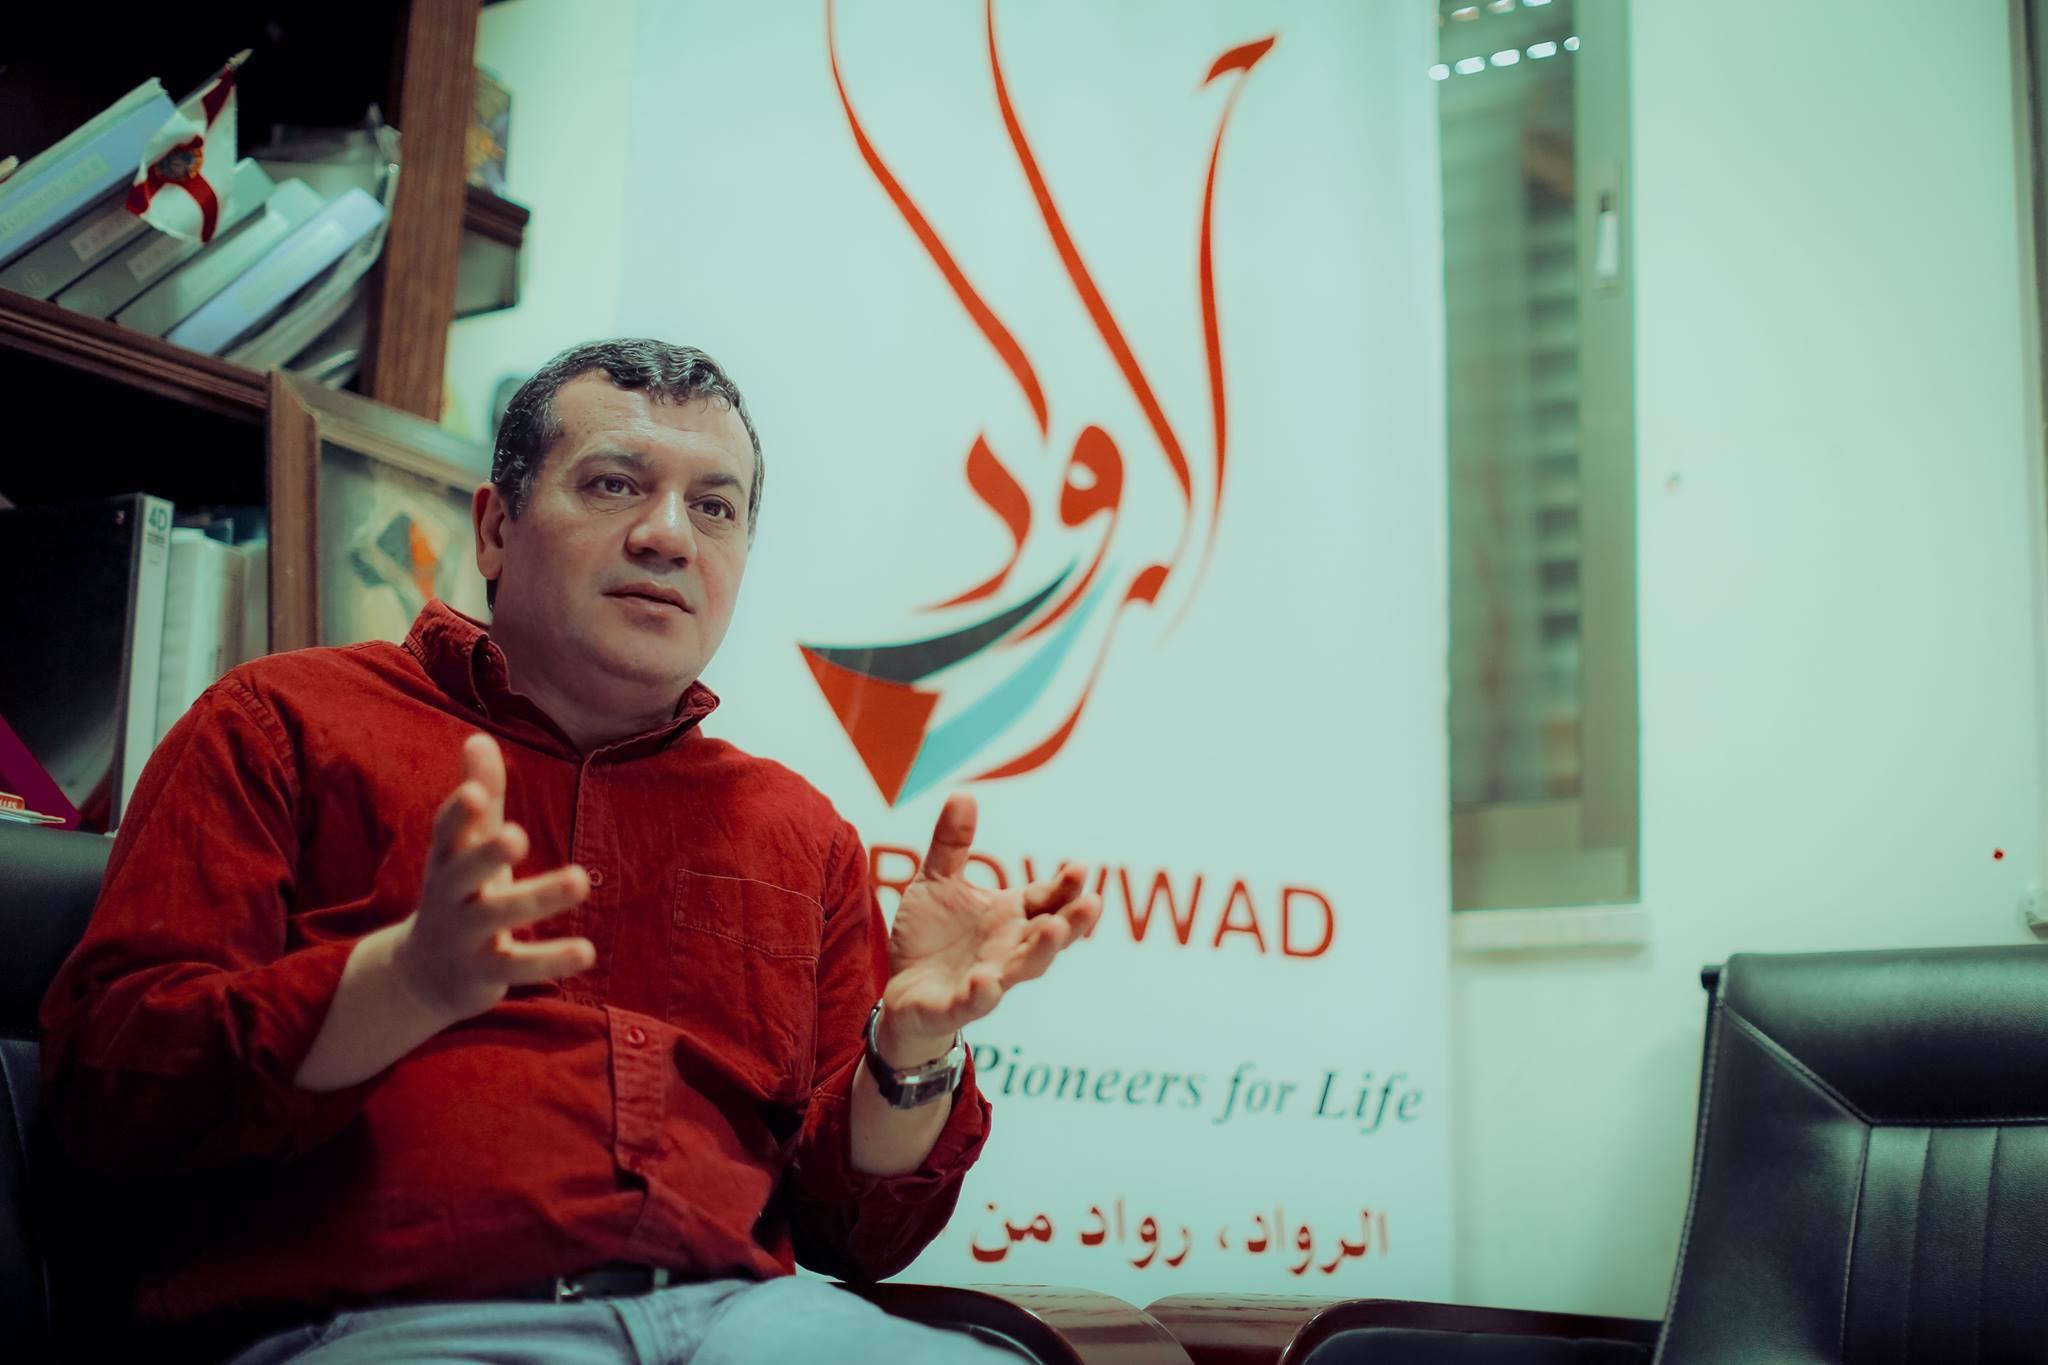 Mr. Abdelfattah Abusrour